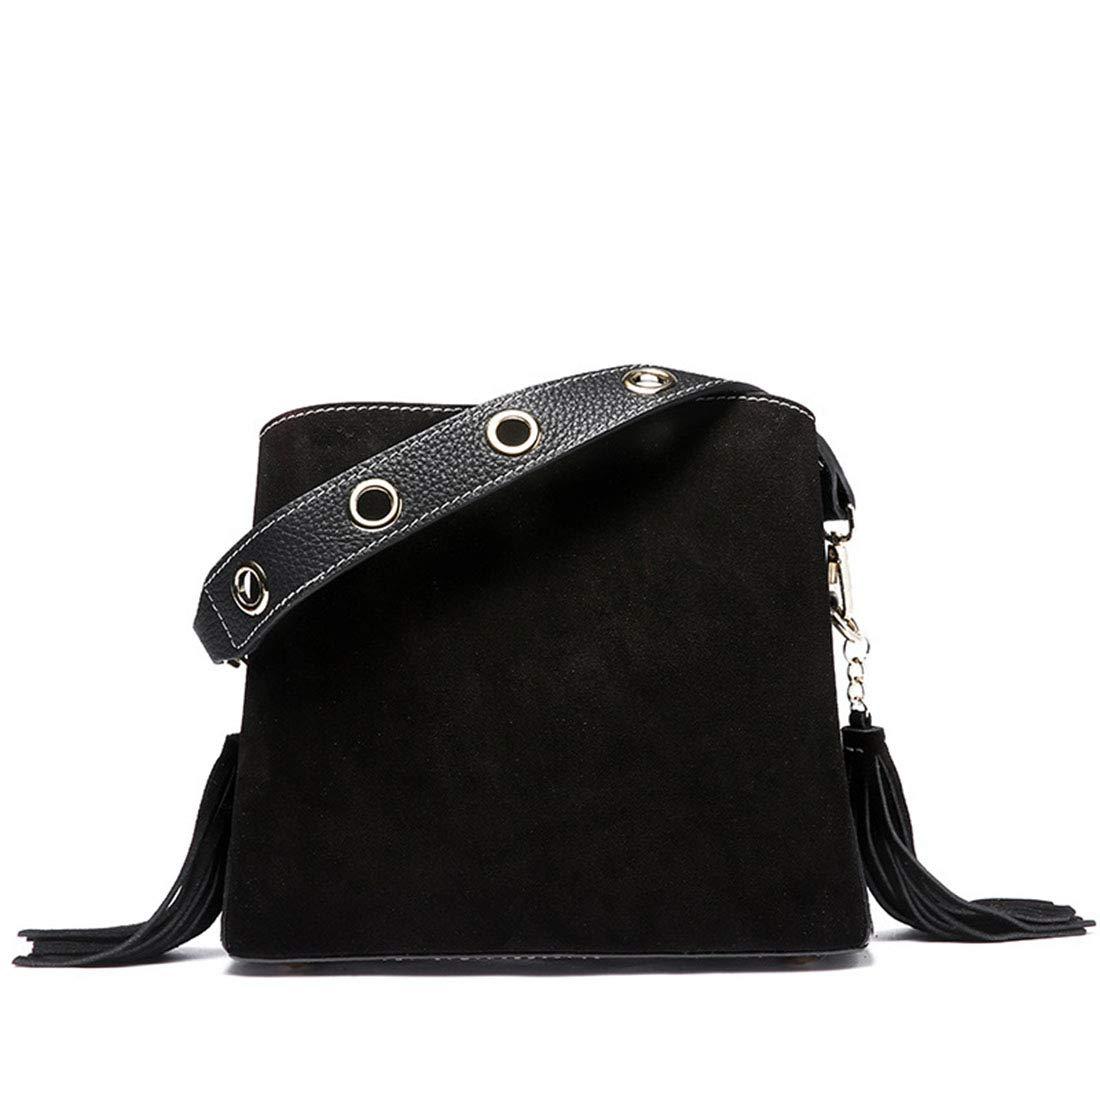 Caramel Color Carriemeow Simple Retro Zipper Bucket Type Leather Shoulder Bag Messenger Bag Color : Green